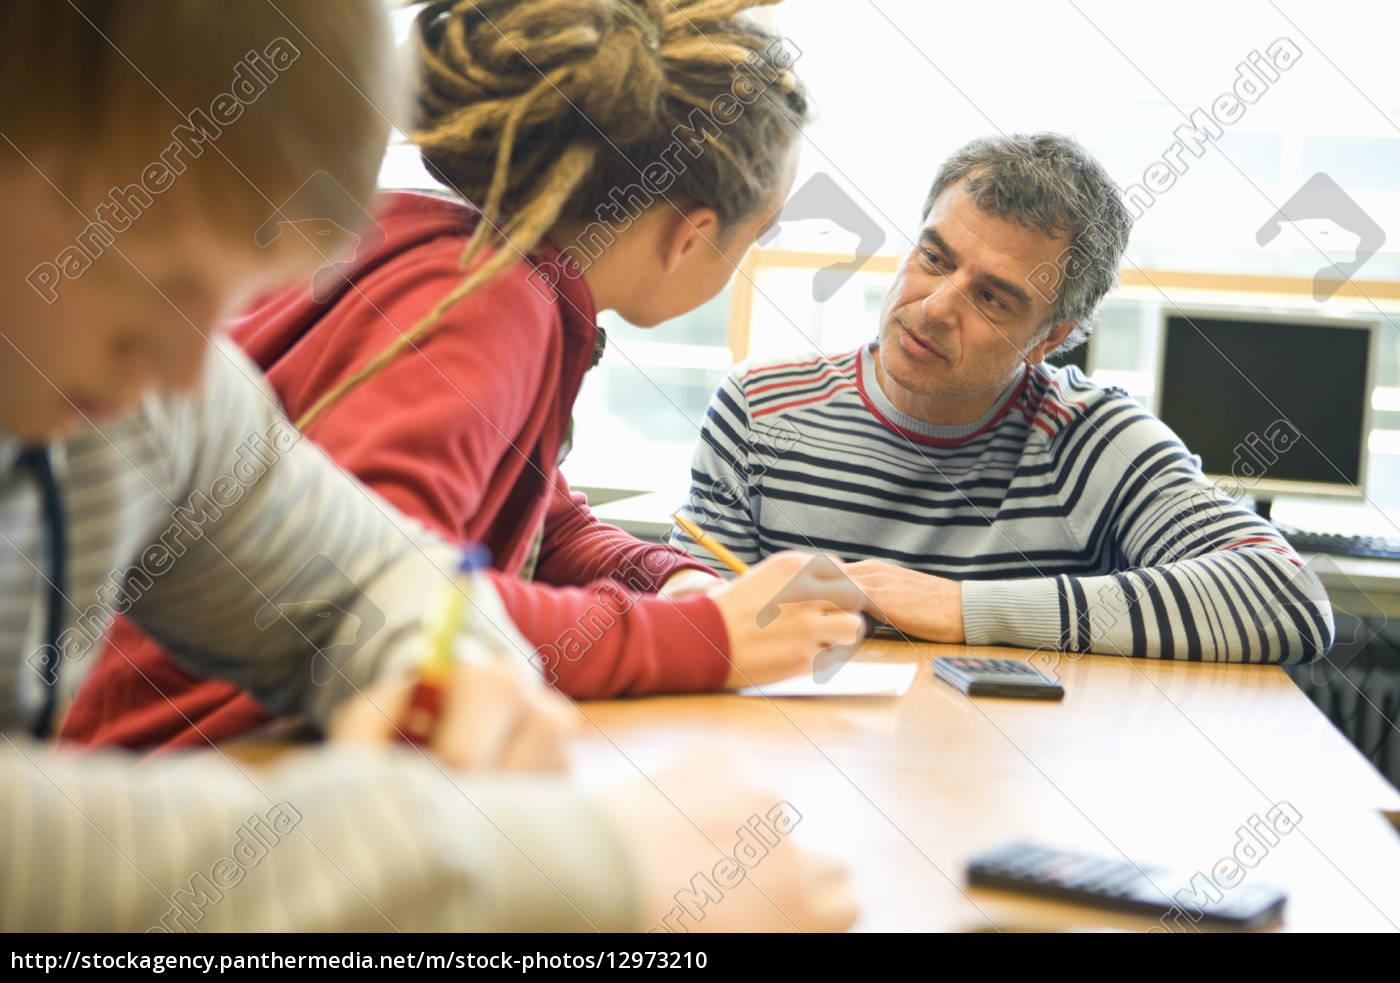 teenage, student, getting, help, from, teacher - 12973210